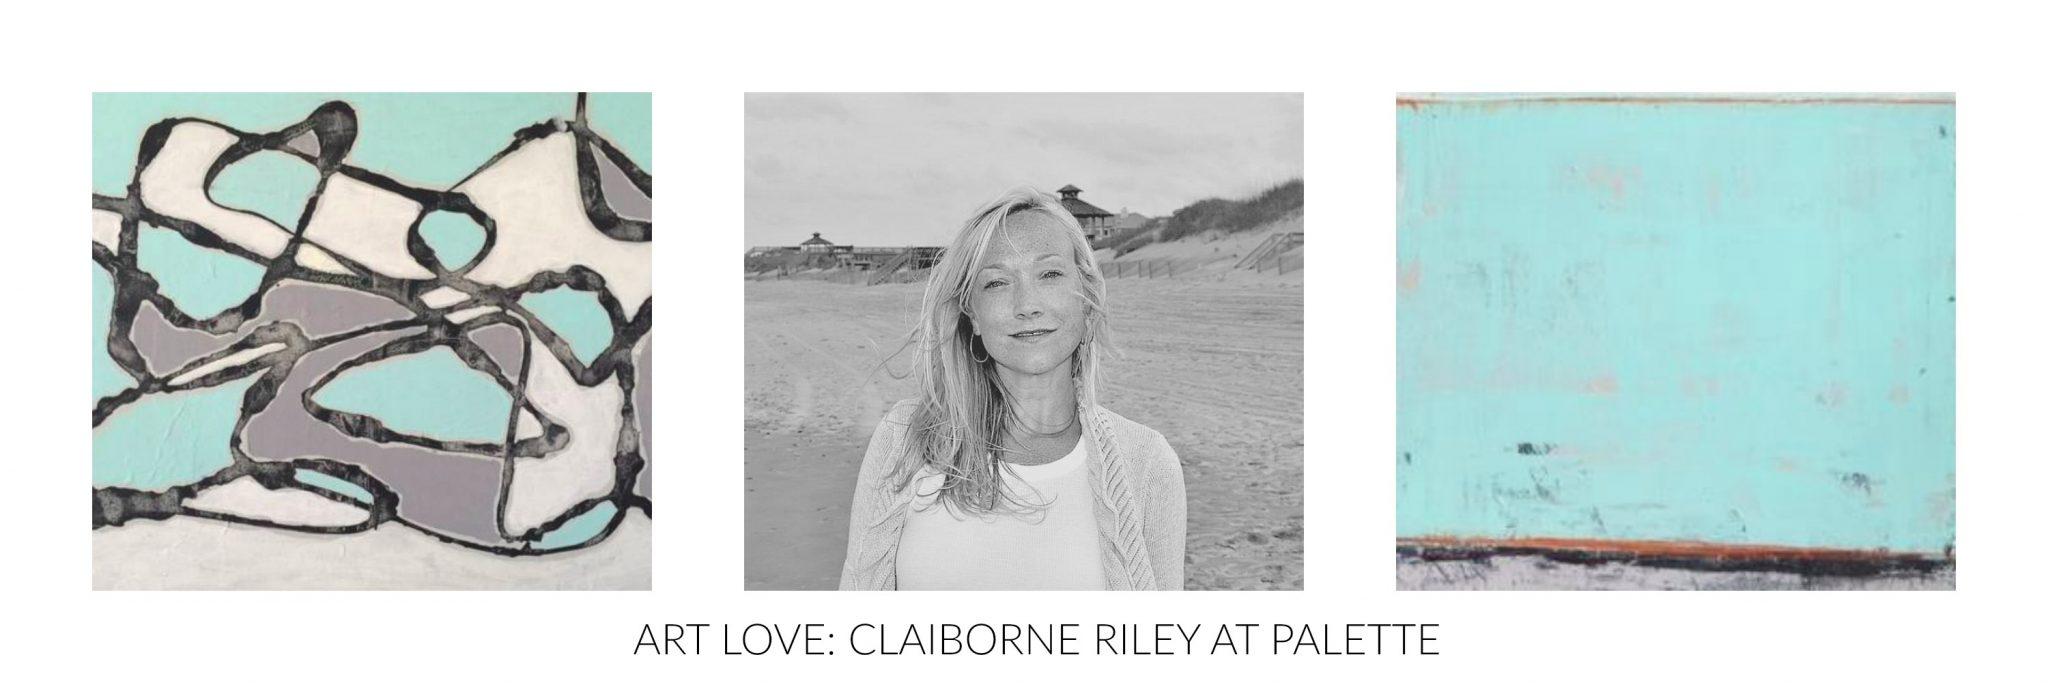 Claiborne.riley5